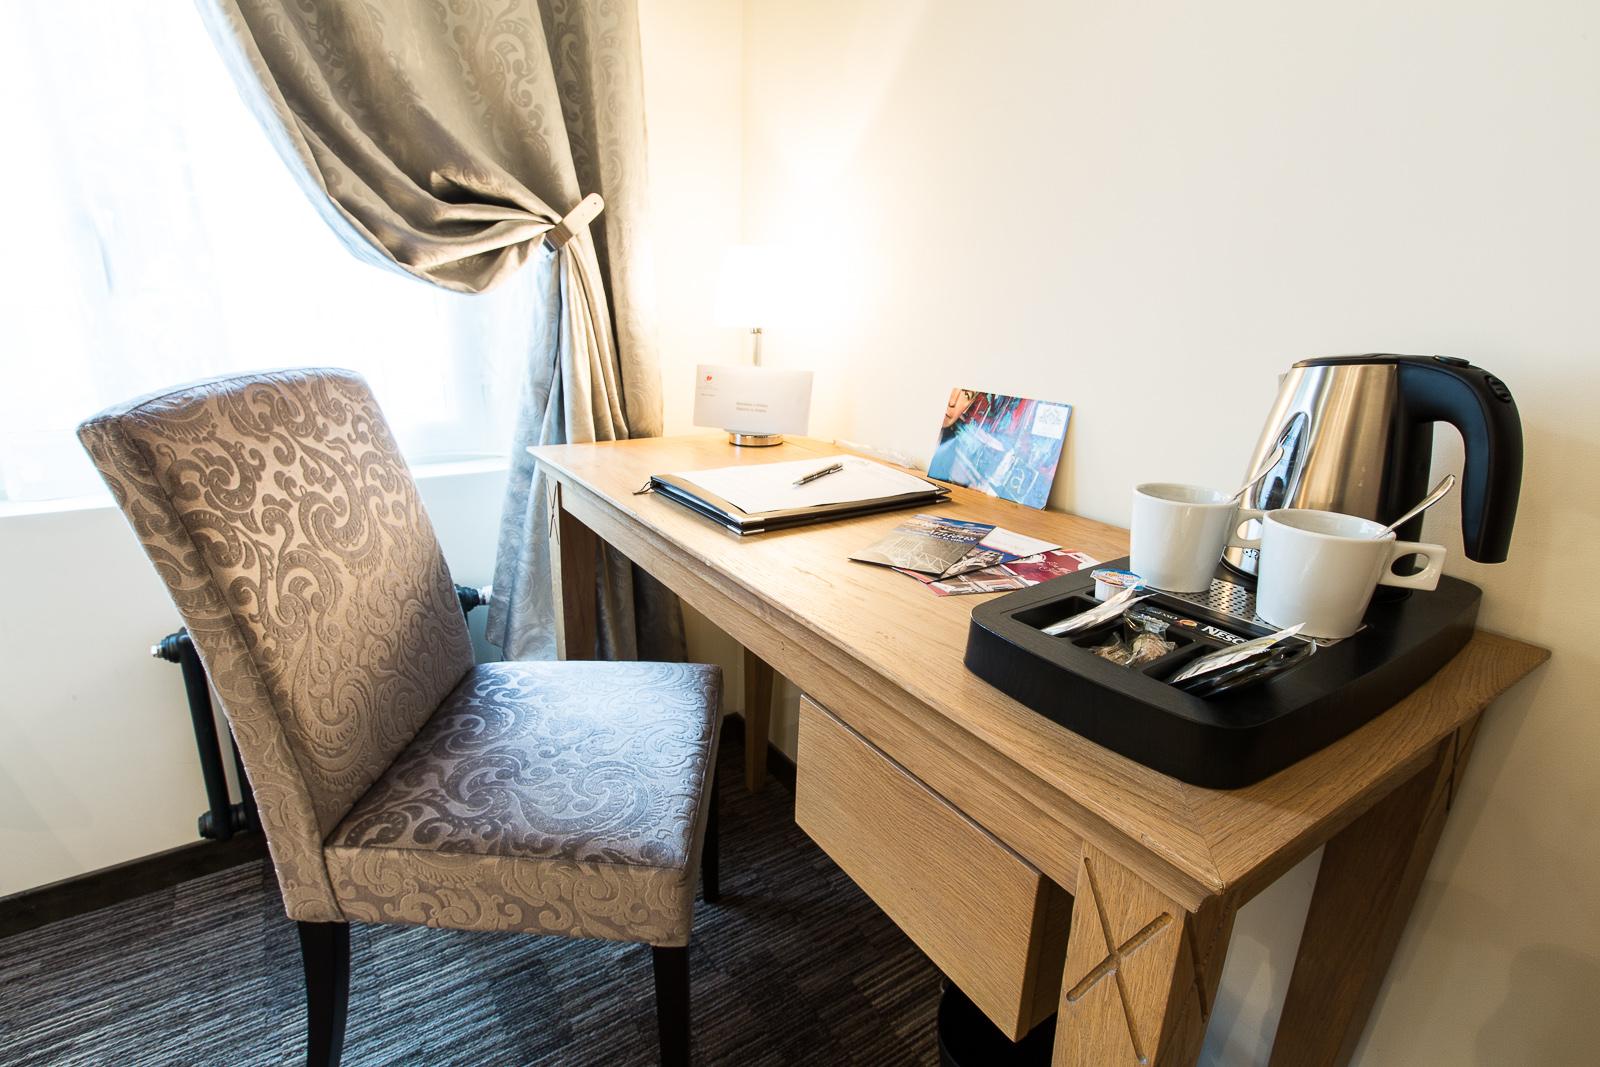 Hôtel Marotte chambre cosy café